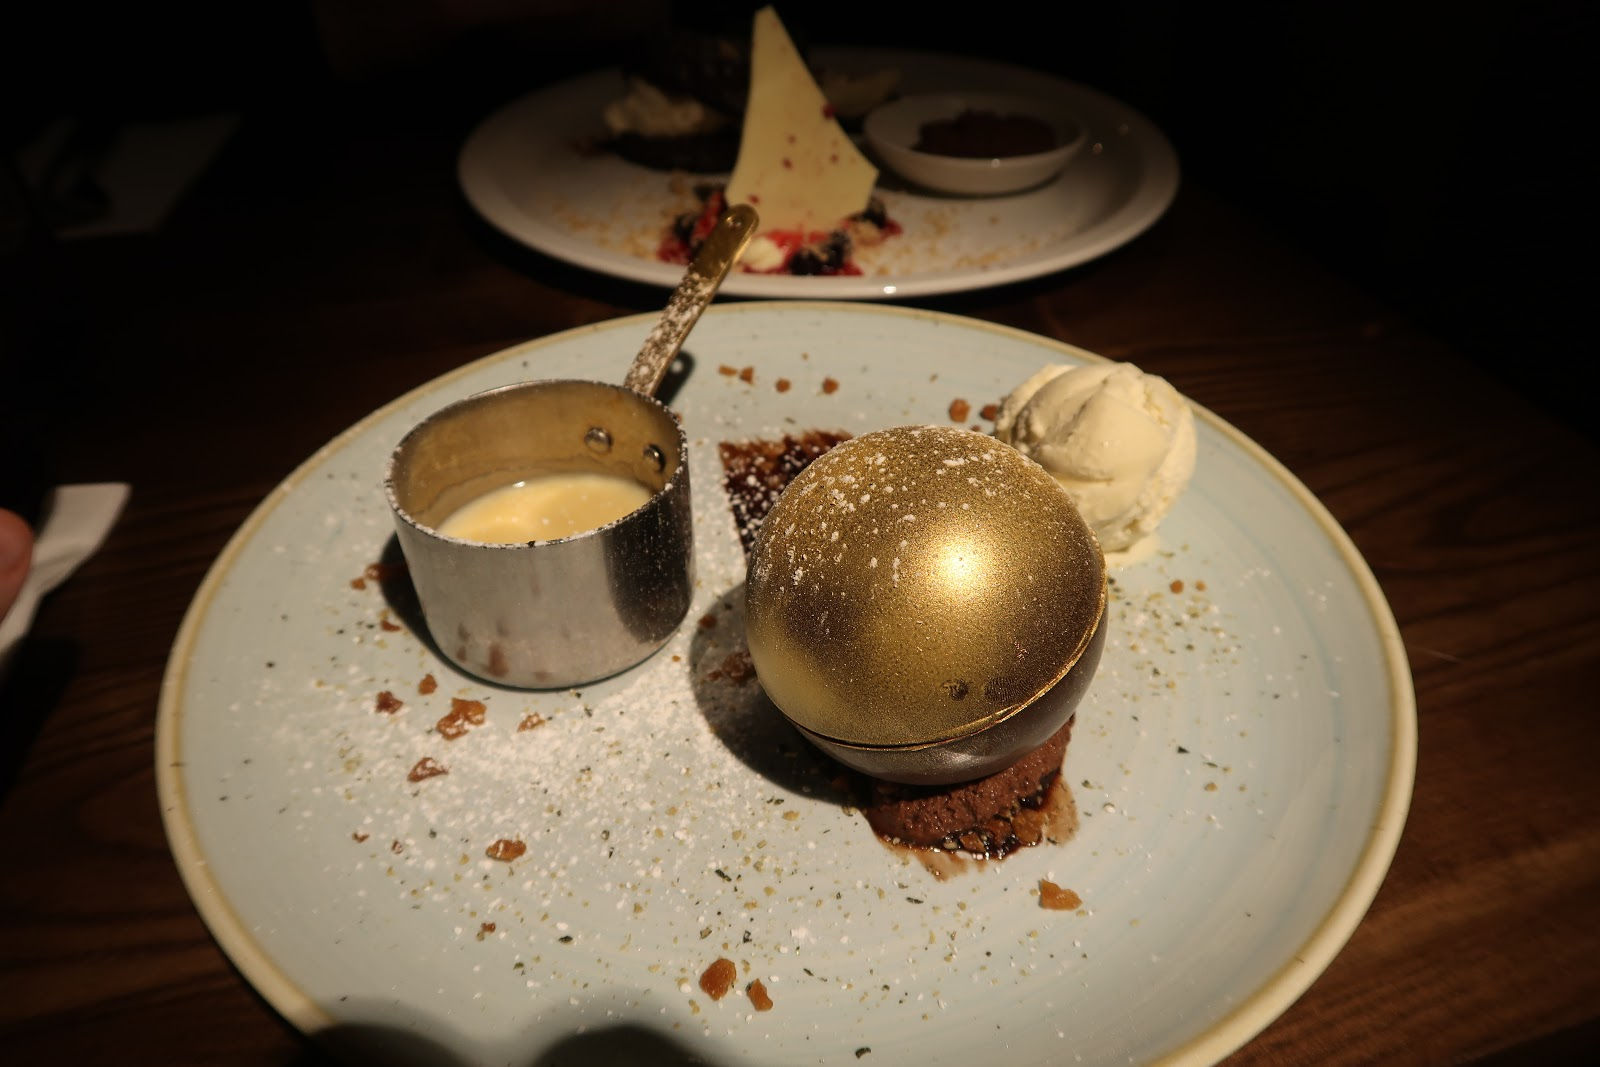 chocolate-and-hazelnut-bomb